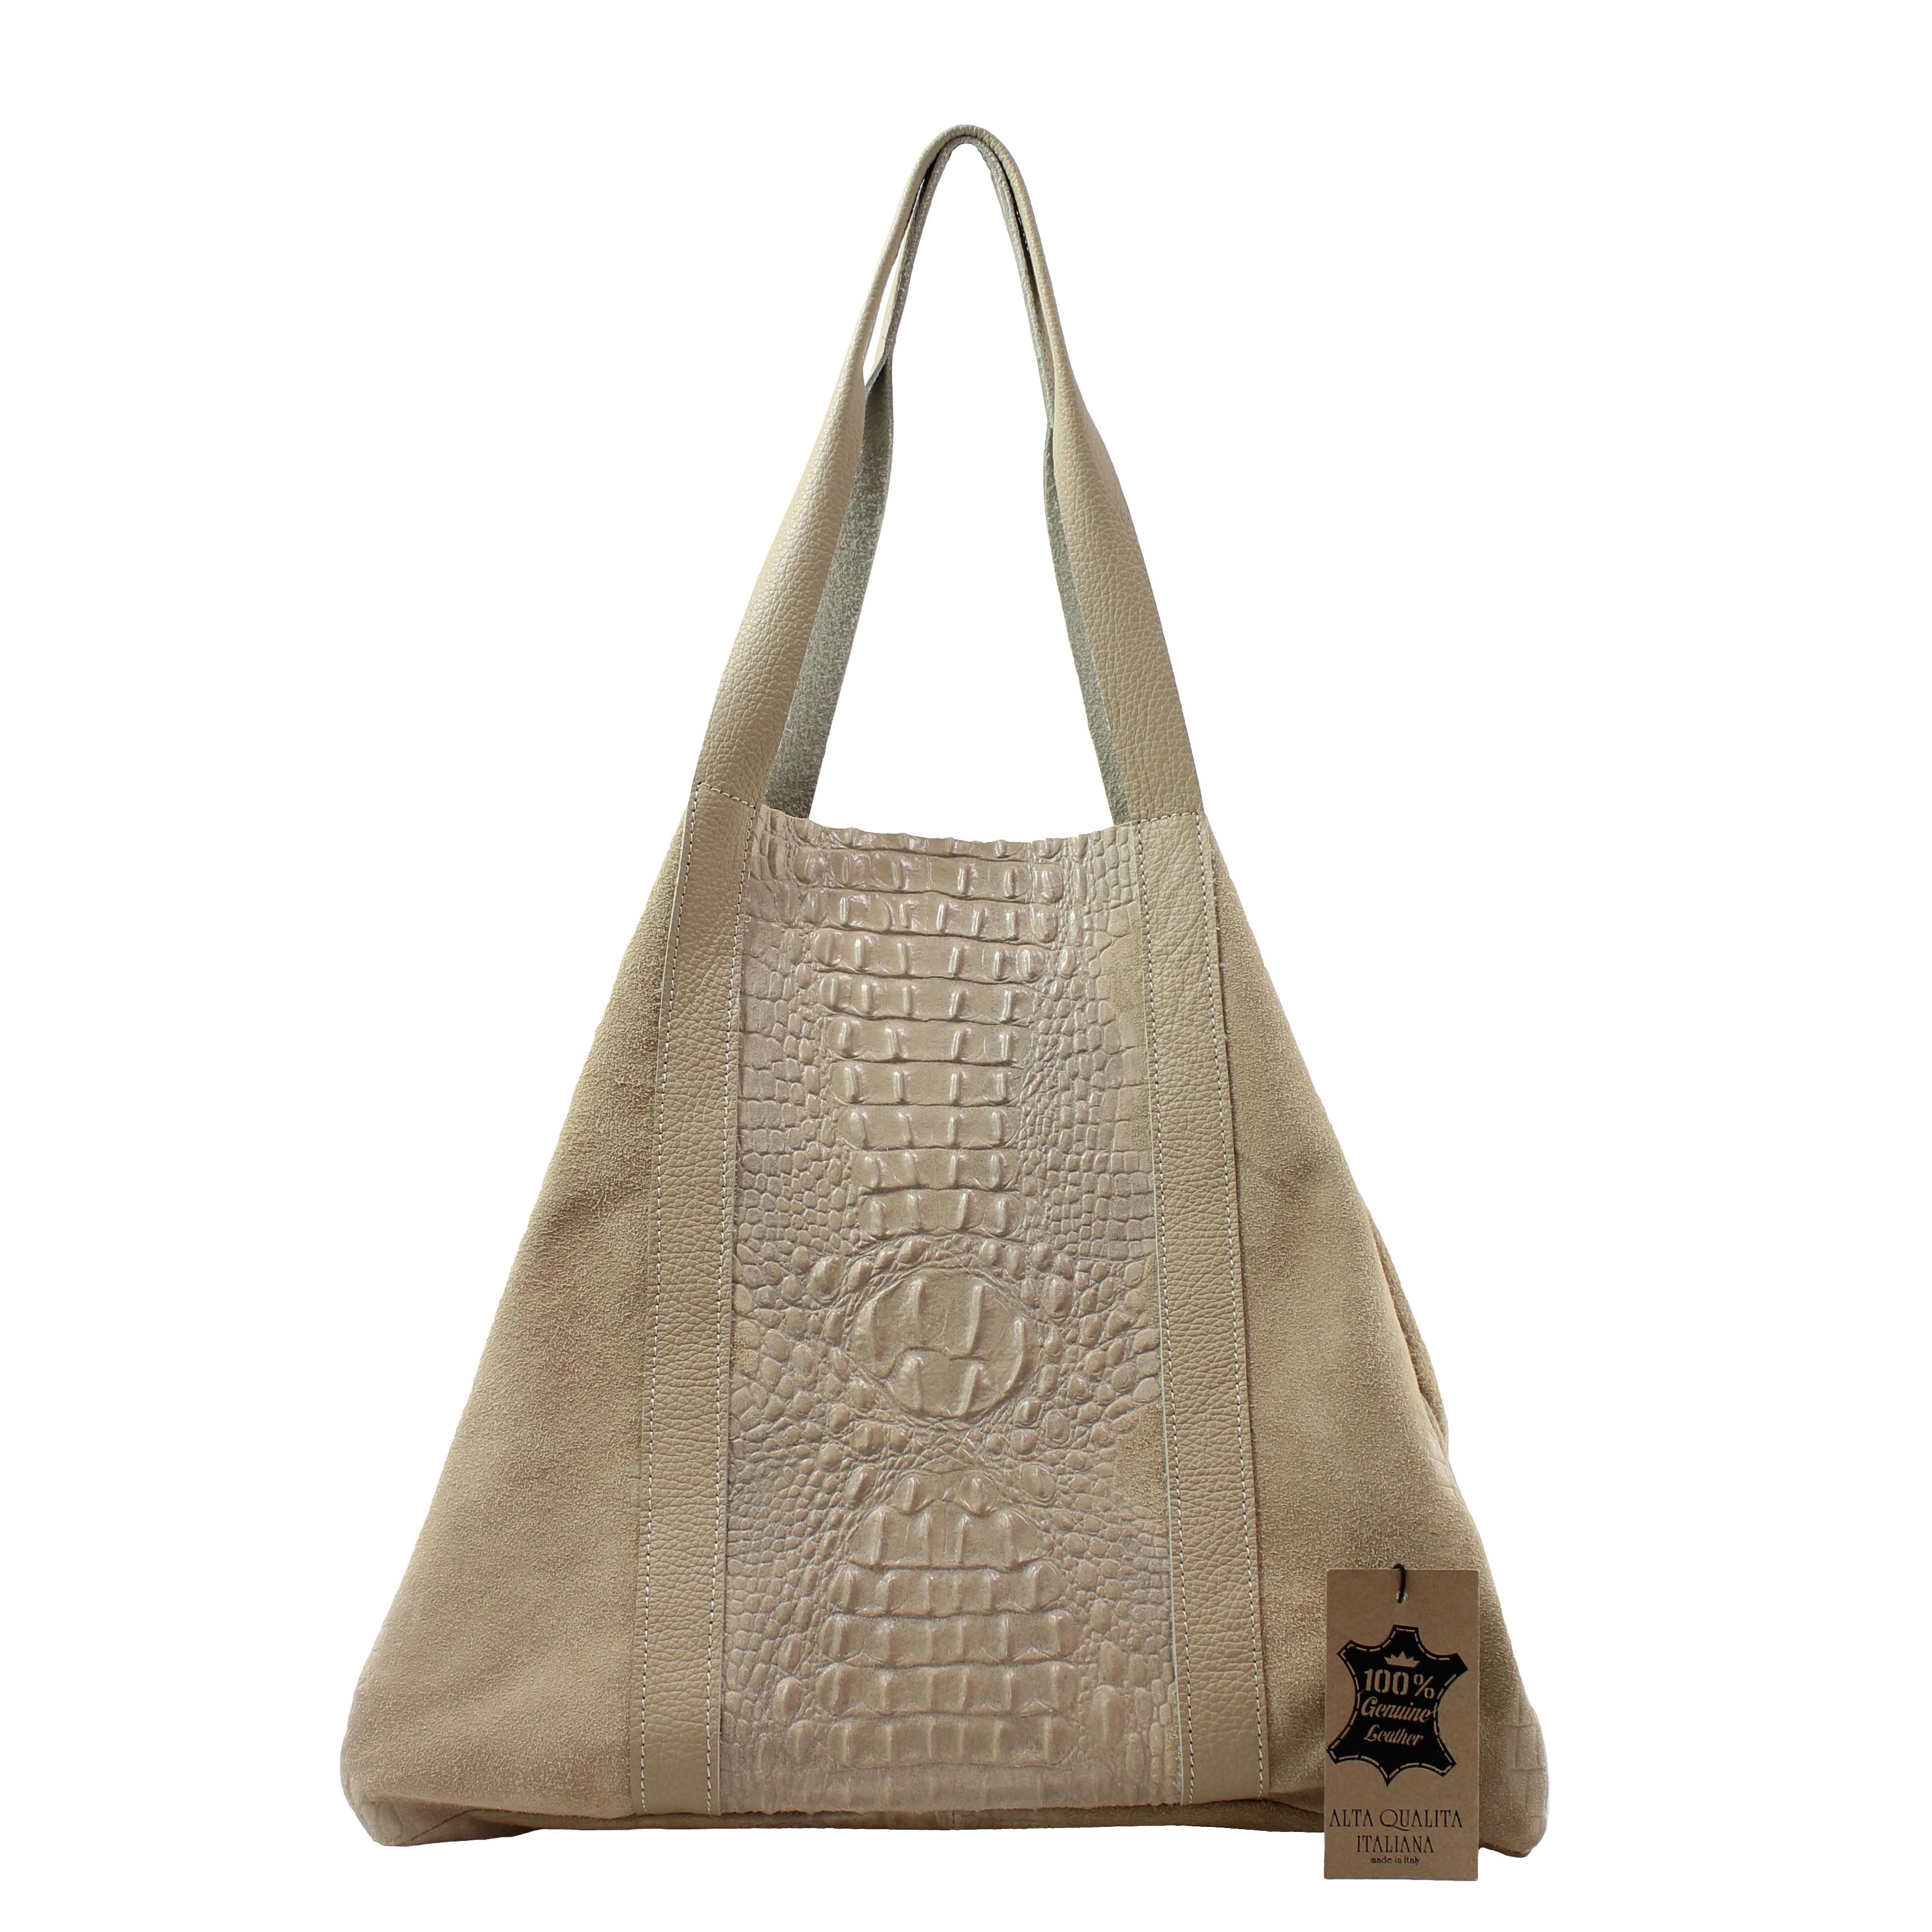 Kožená velká krokodýlí béžová hnědá taška na rameno janesi 2v1